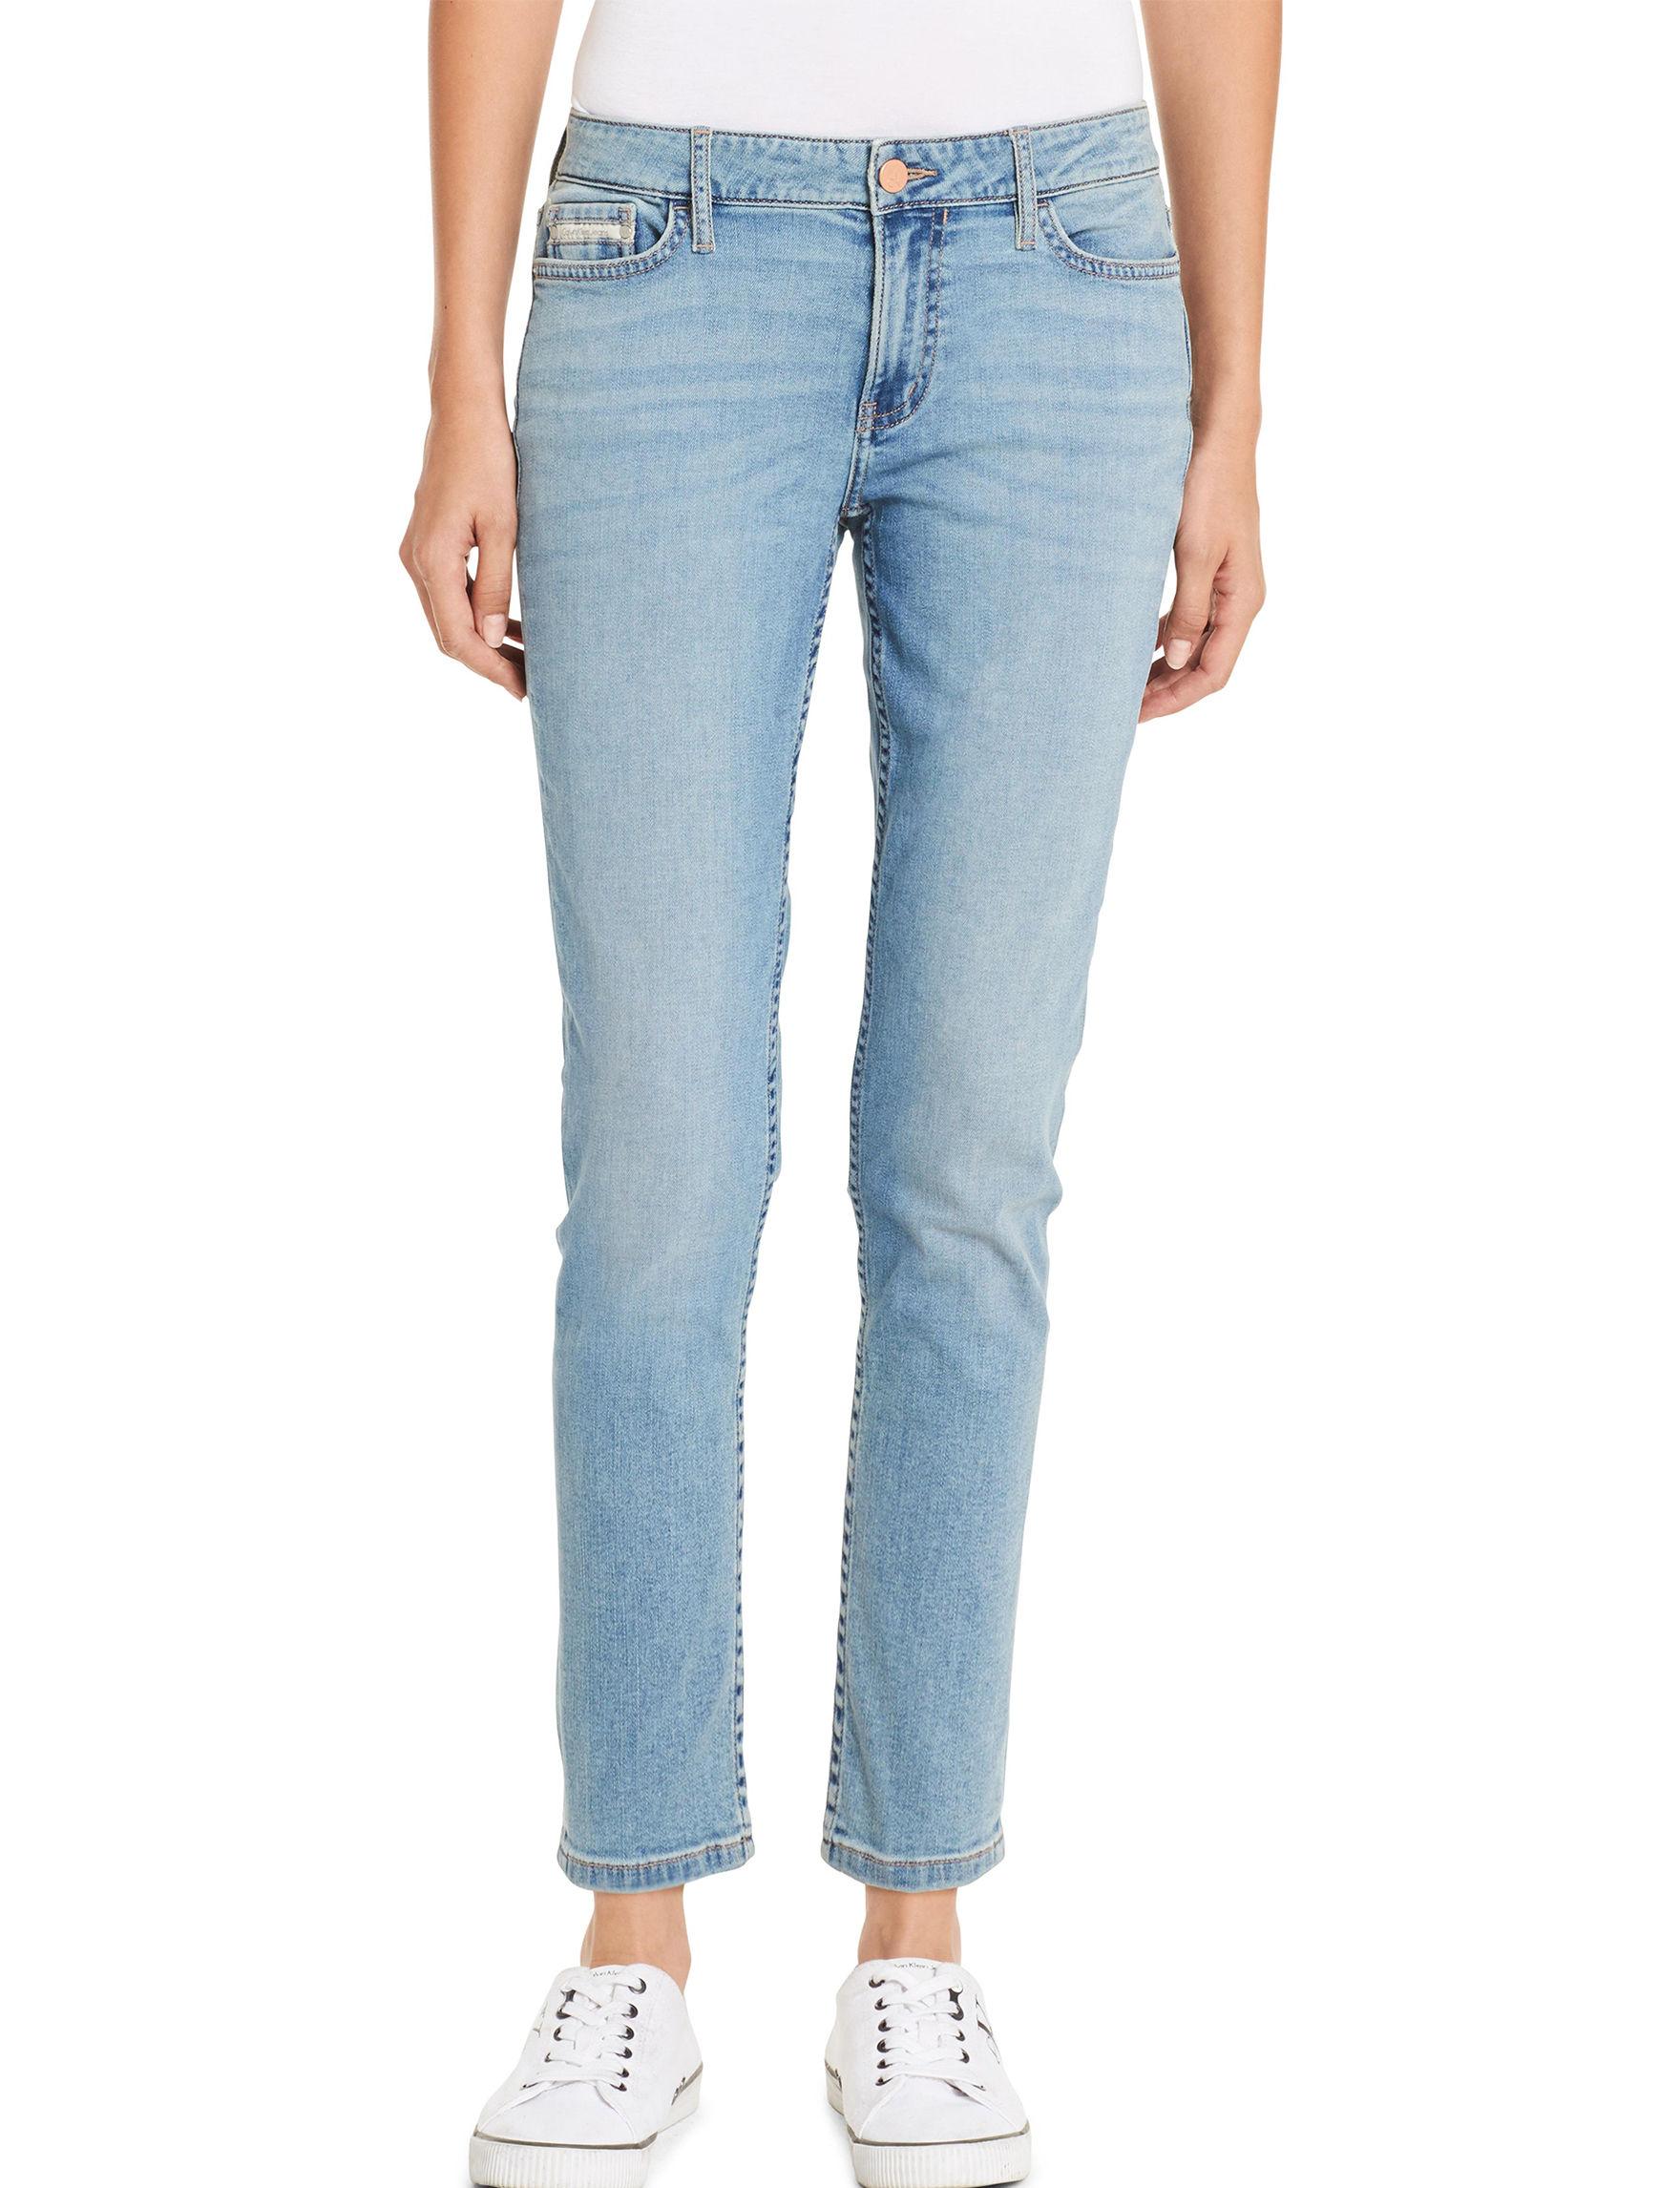 Calvin Klein Jeans Light Wash Skinny